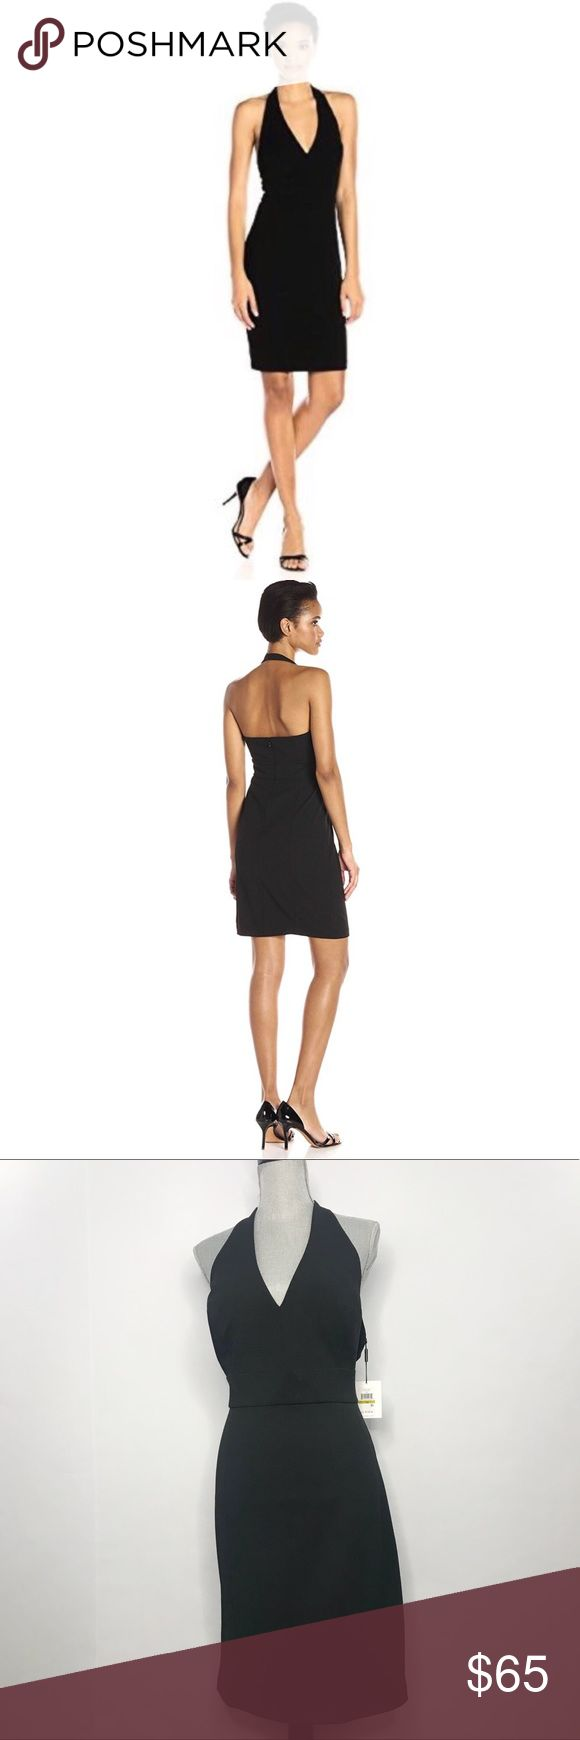 Calvin Klein halter dress Sexy little black dress. Halter dress with button closet at neck and zip closure. Calvin Klein Dresses